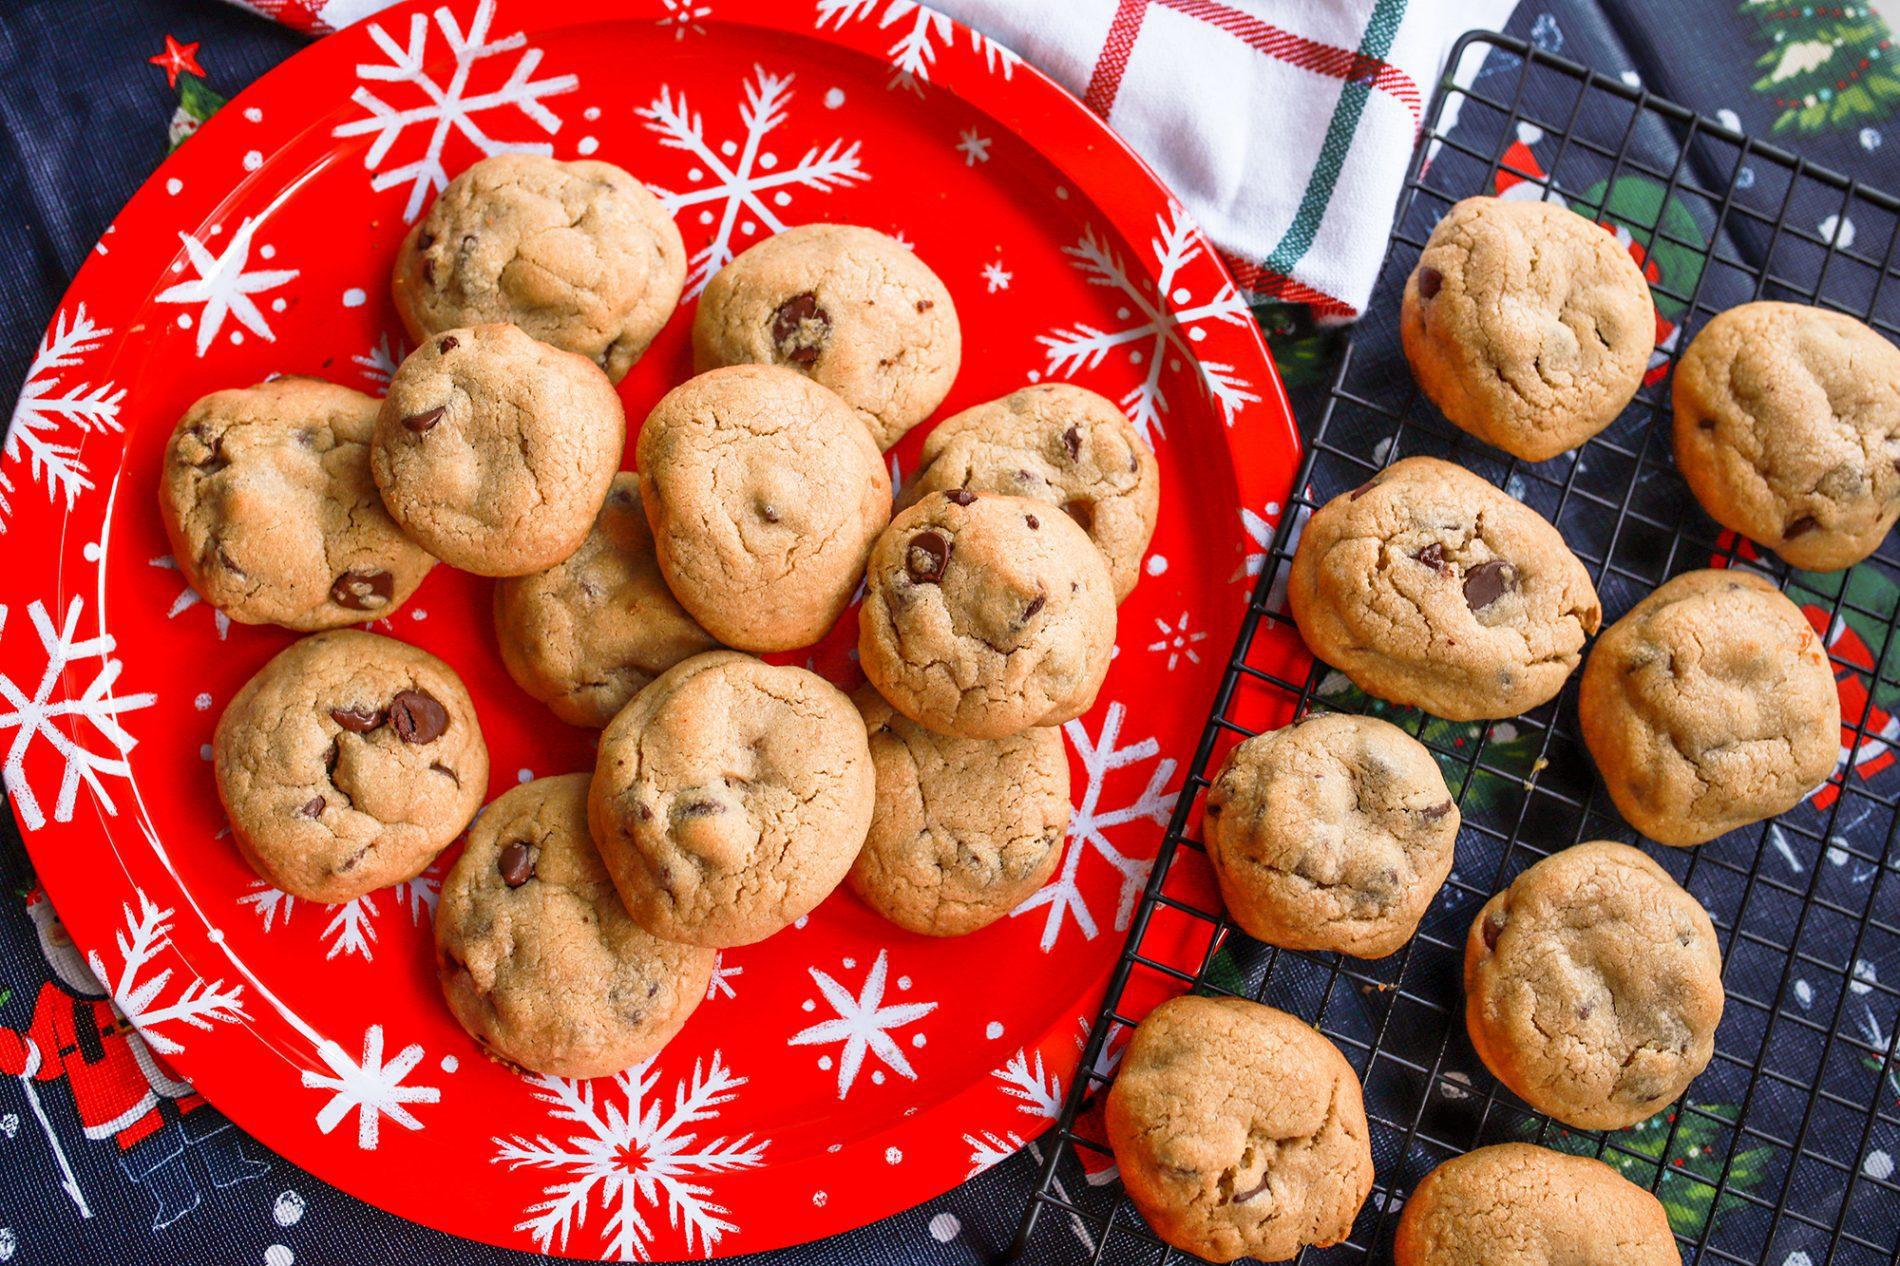 caramel stuffed macchiato and chocolate chip cookies